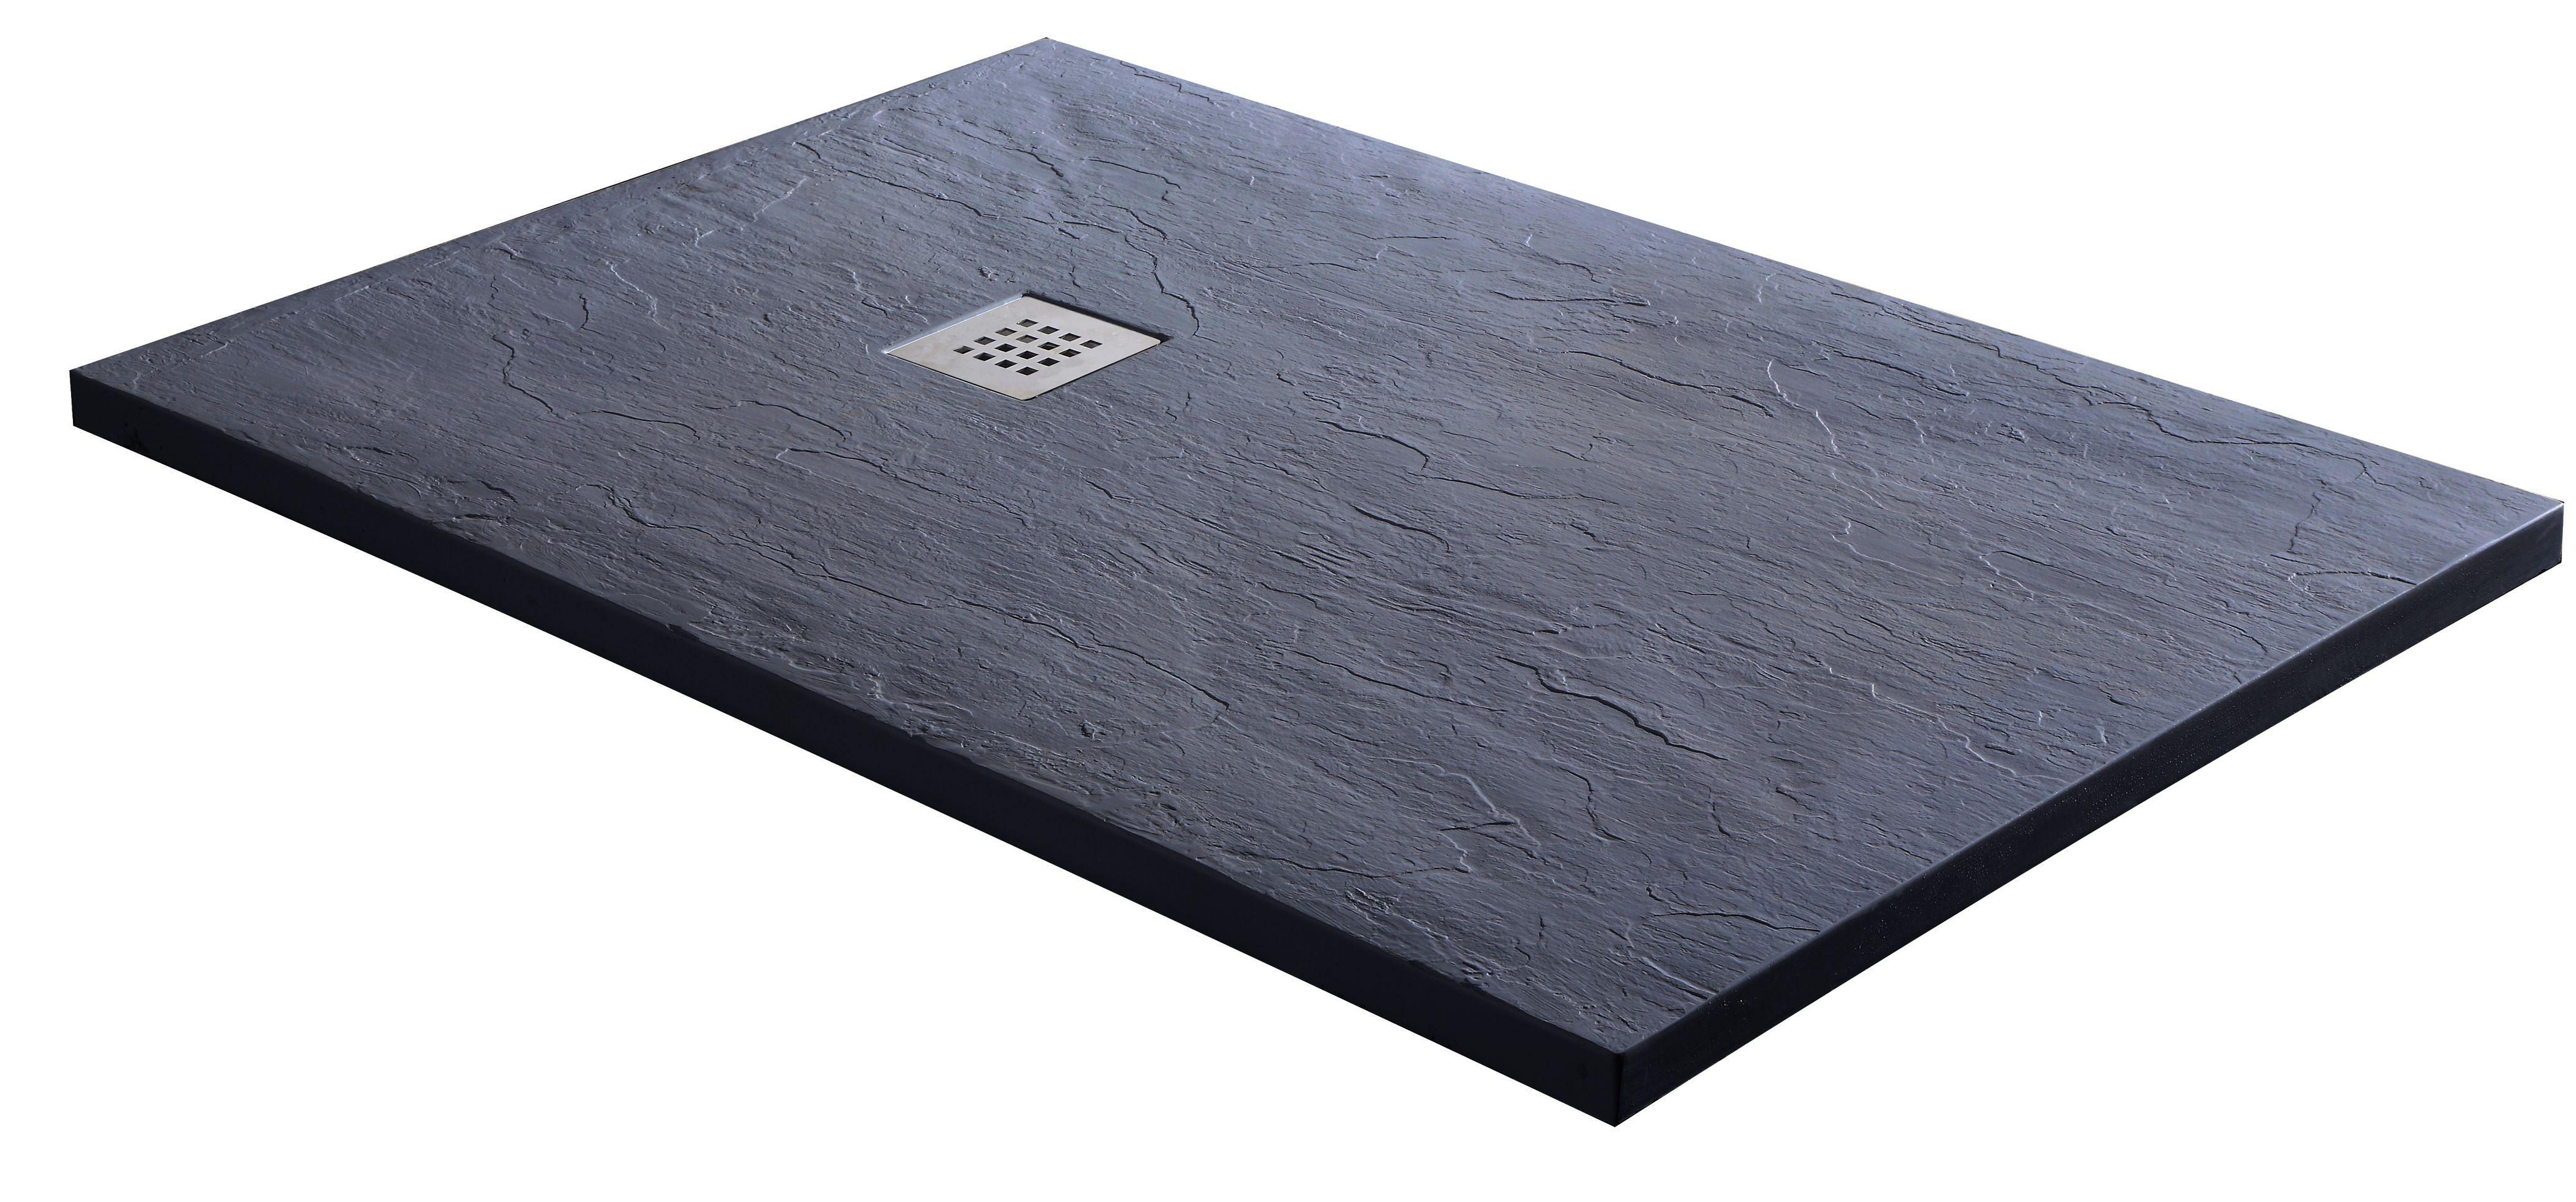 Badstuber Kreta marmer douchebak 120x80x3,2cm rechthoekig